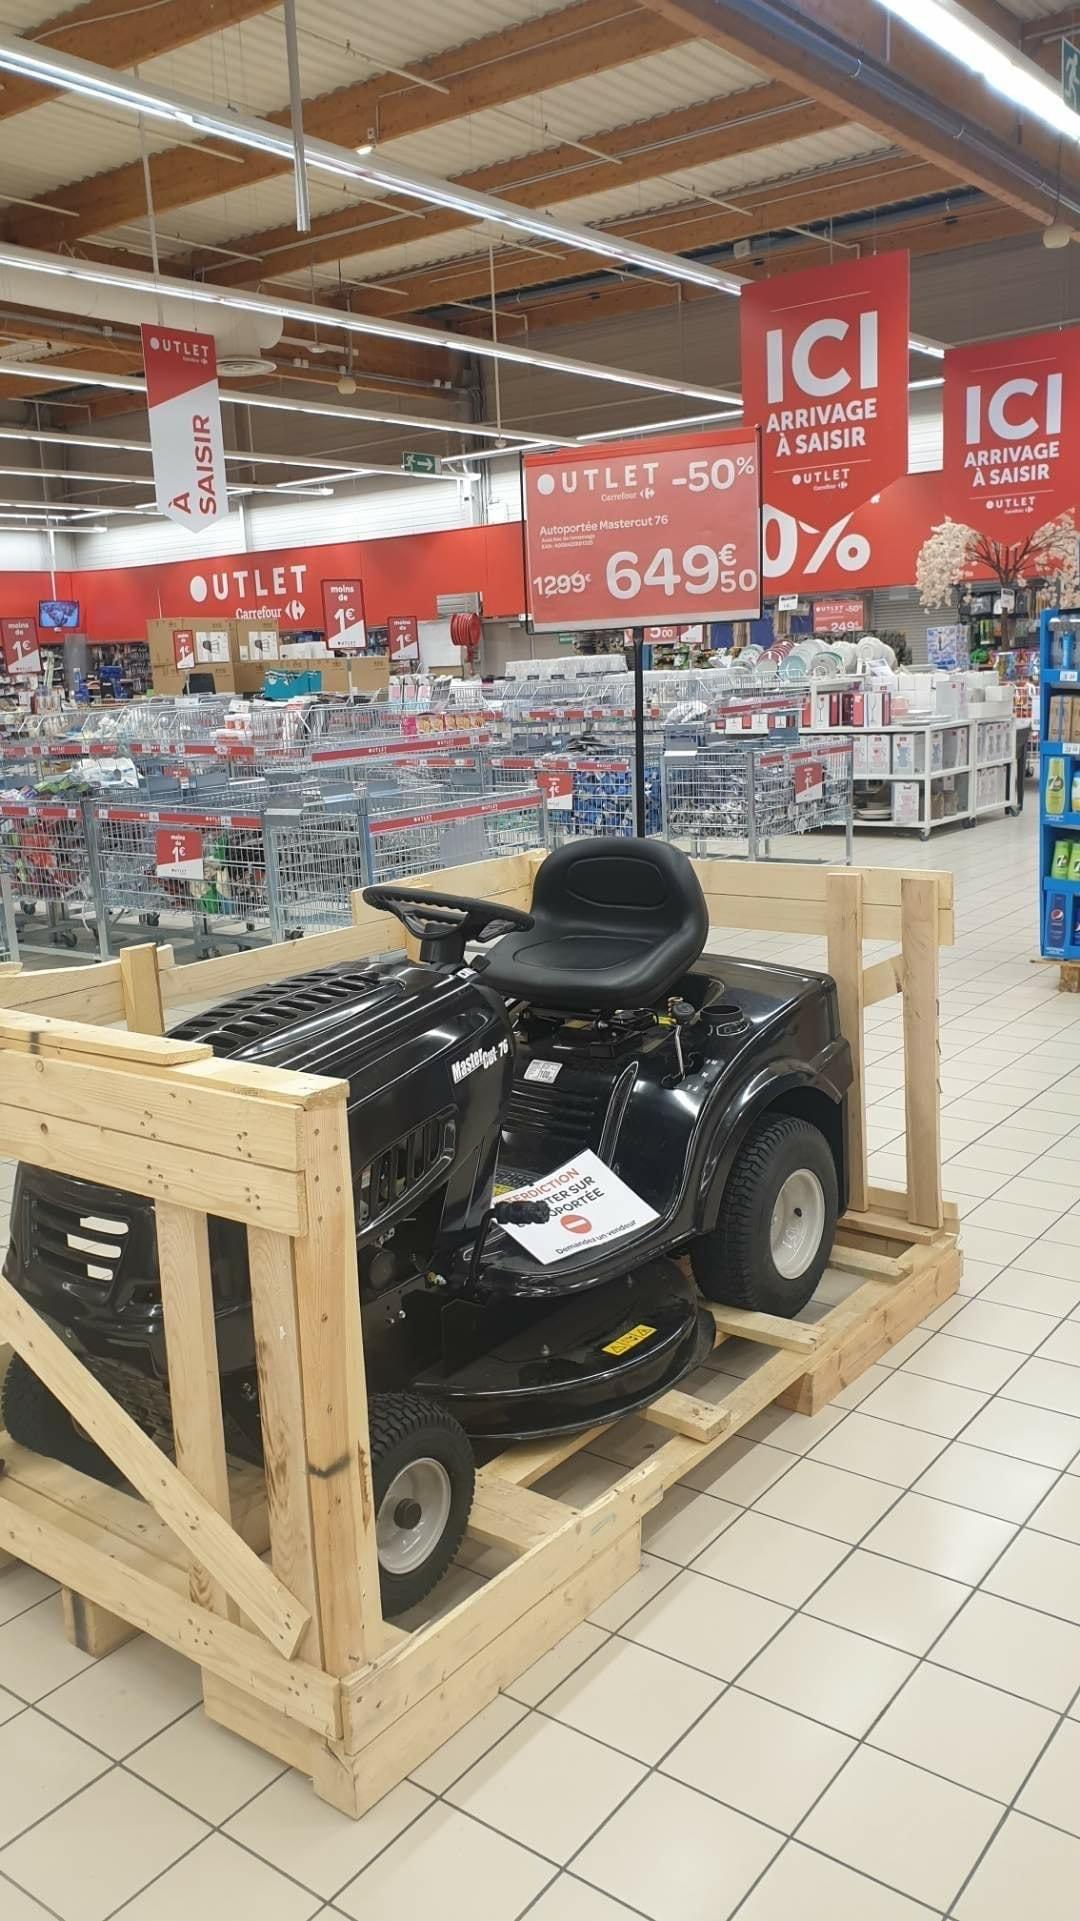 Tracteur tondeuse autoportée Mastercut 76 (382 cm³, 76 cm) - Vaulx-en-Velin (69)